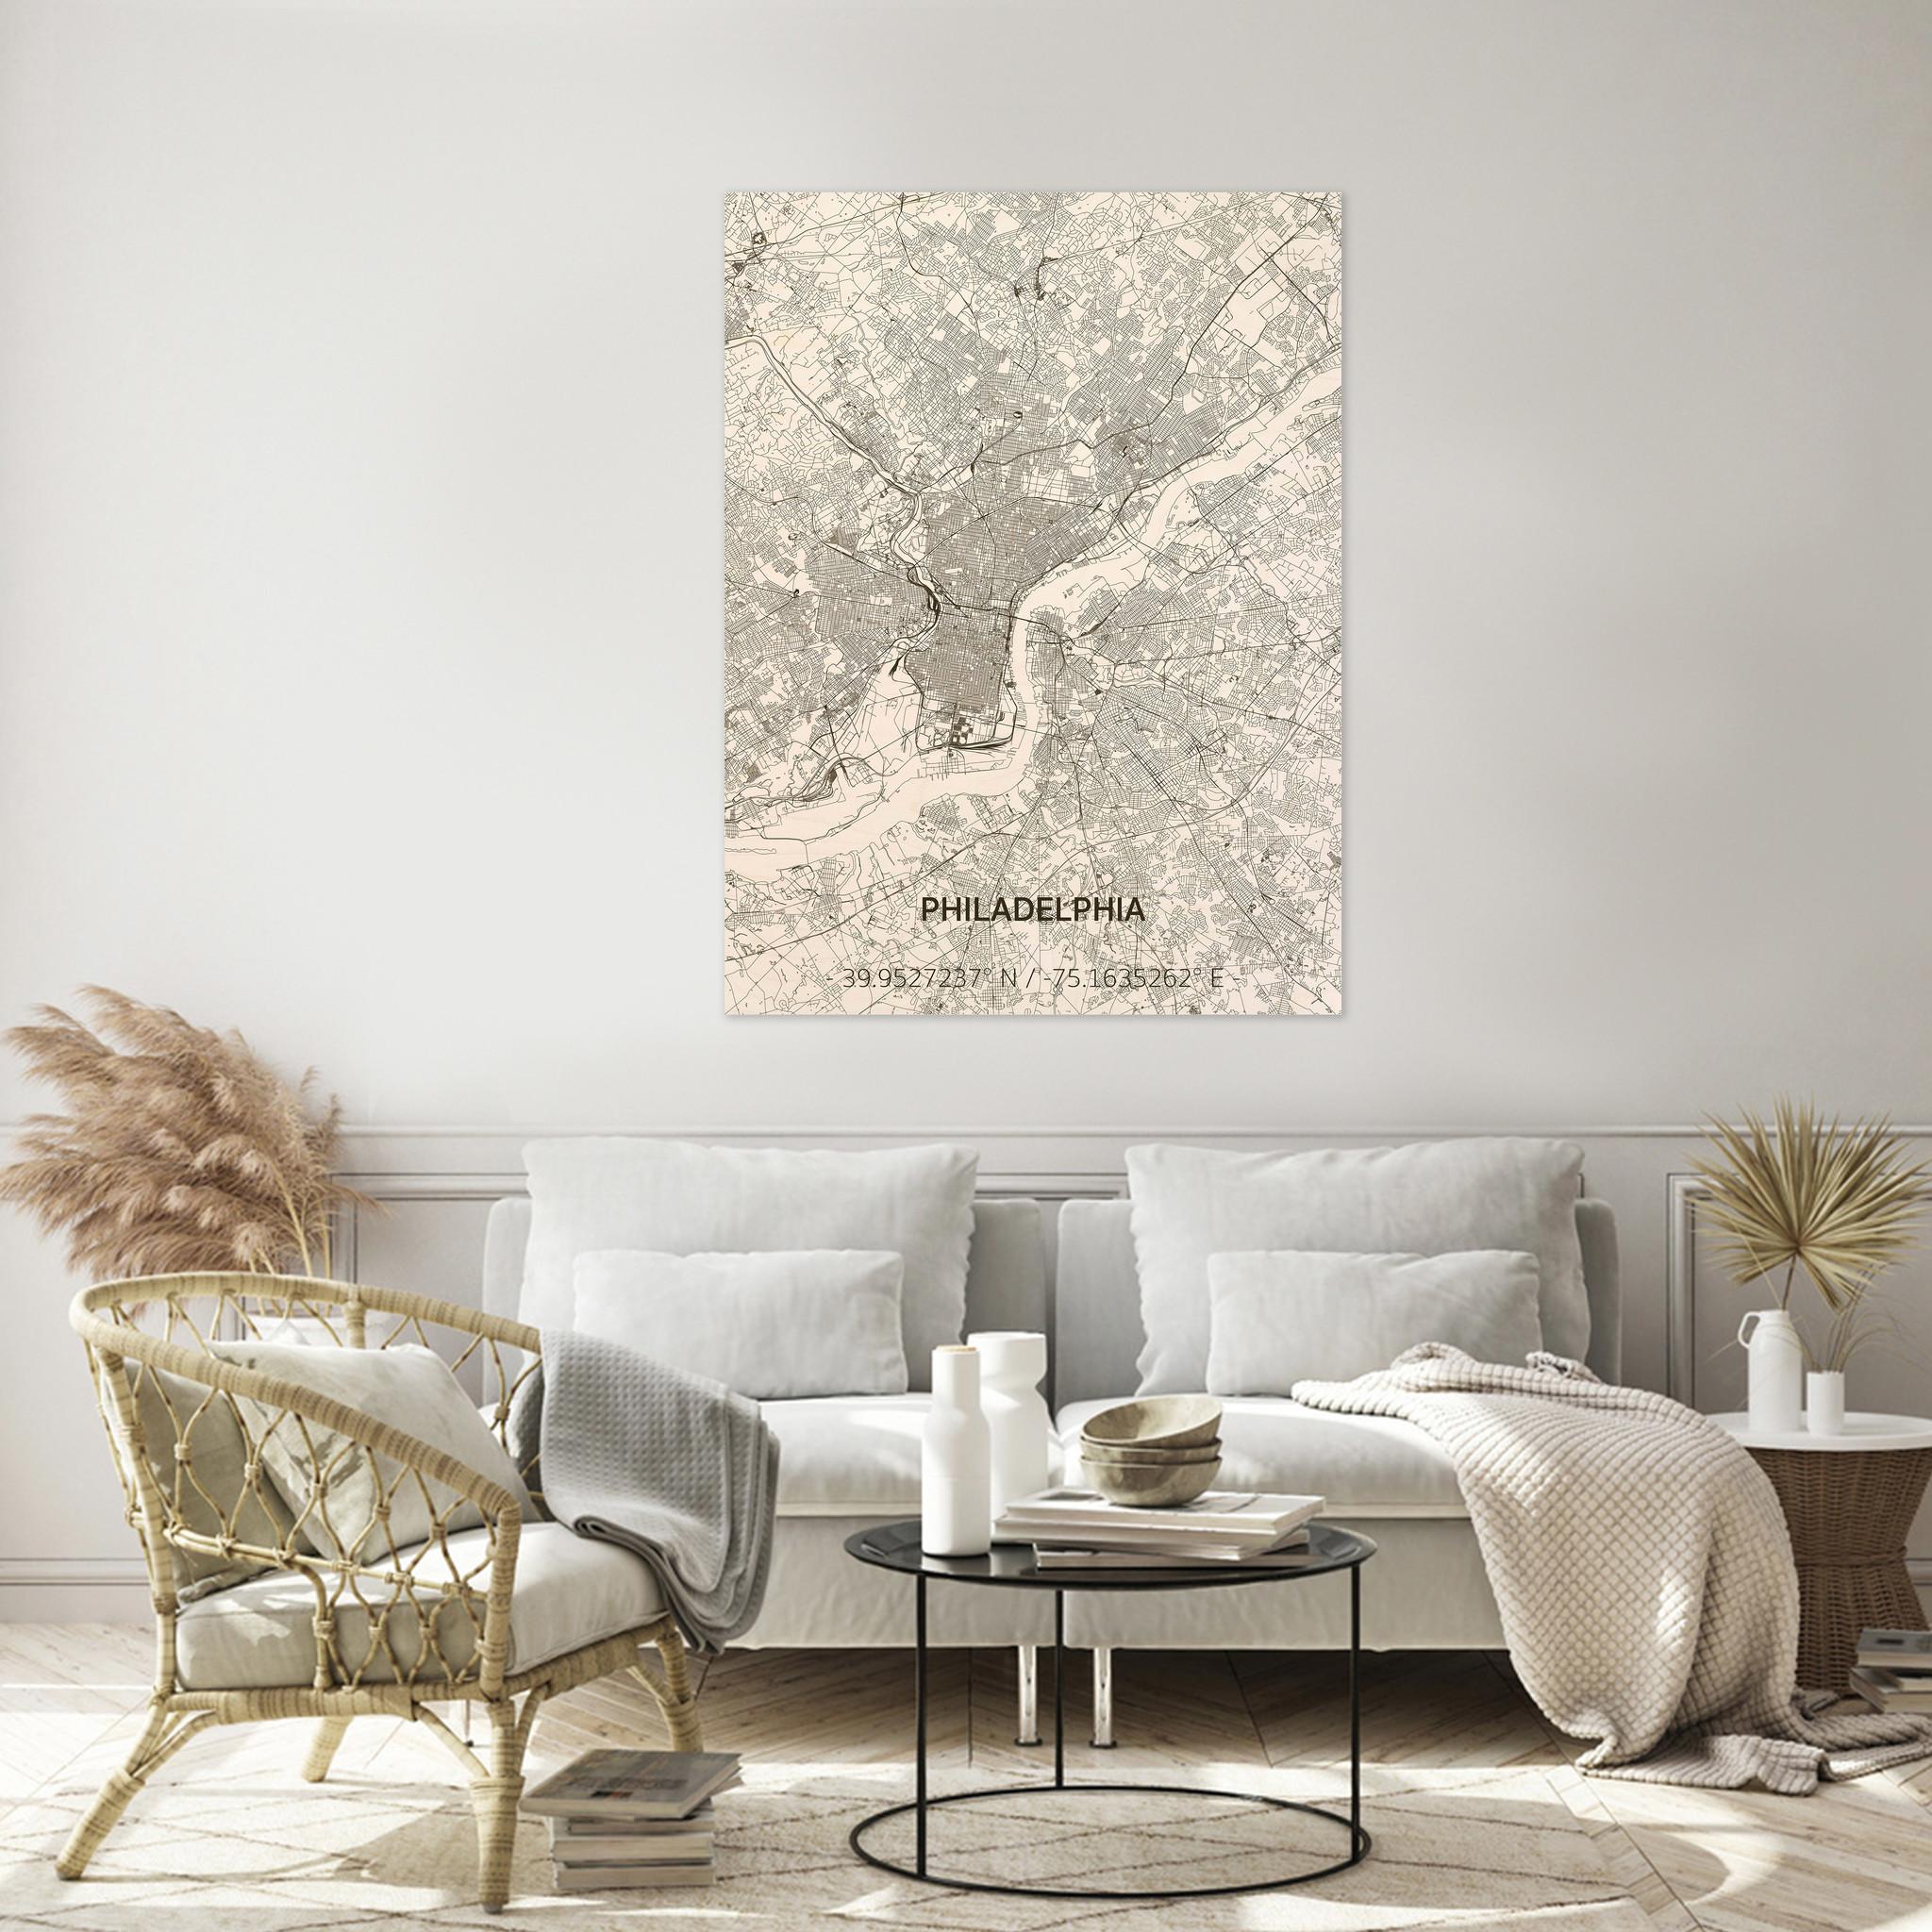 Stadtplan Philadelphia | Wanddekoration Holz-2